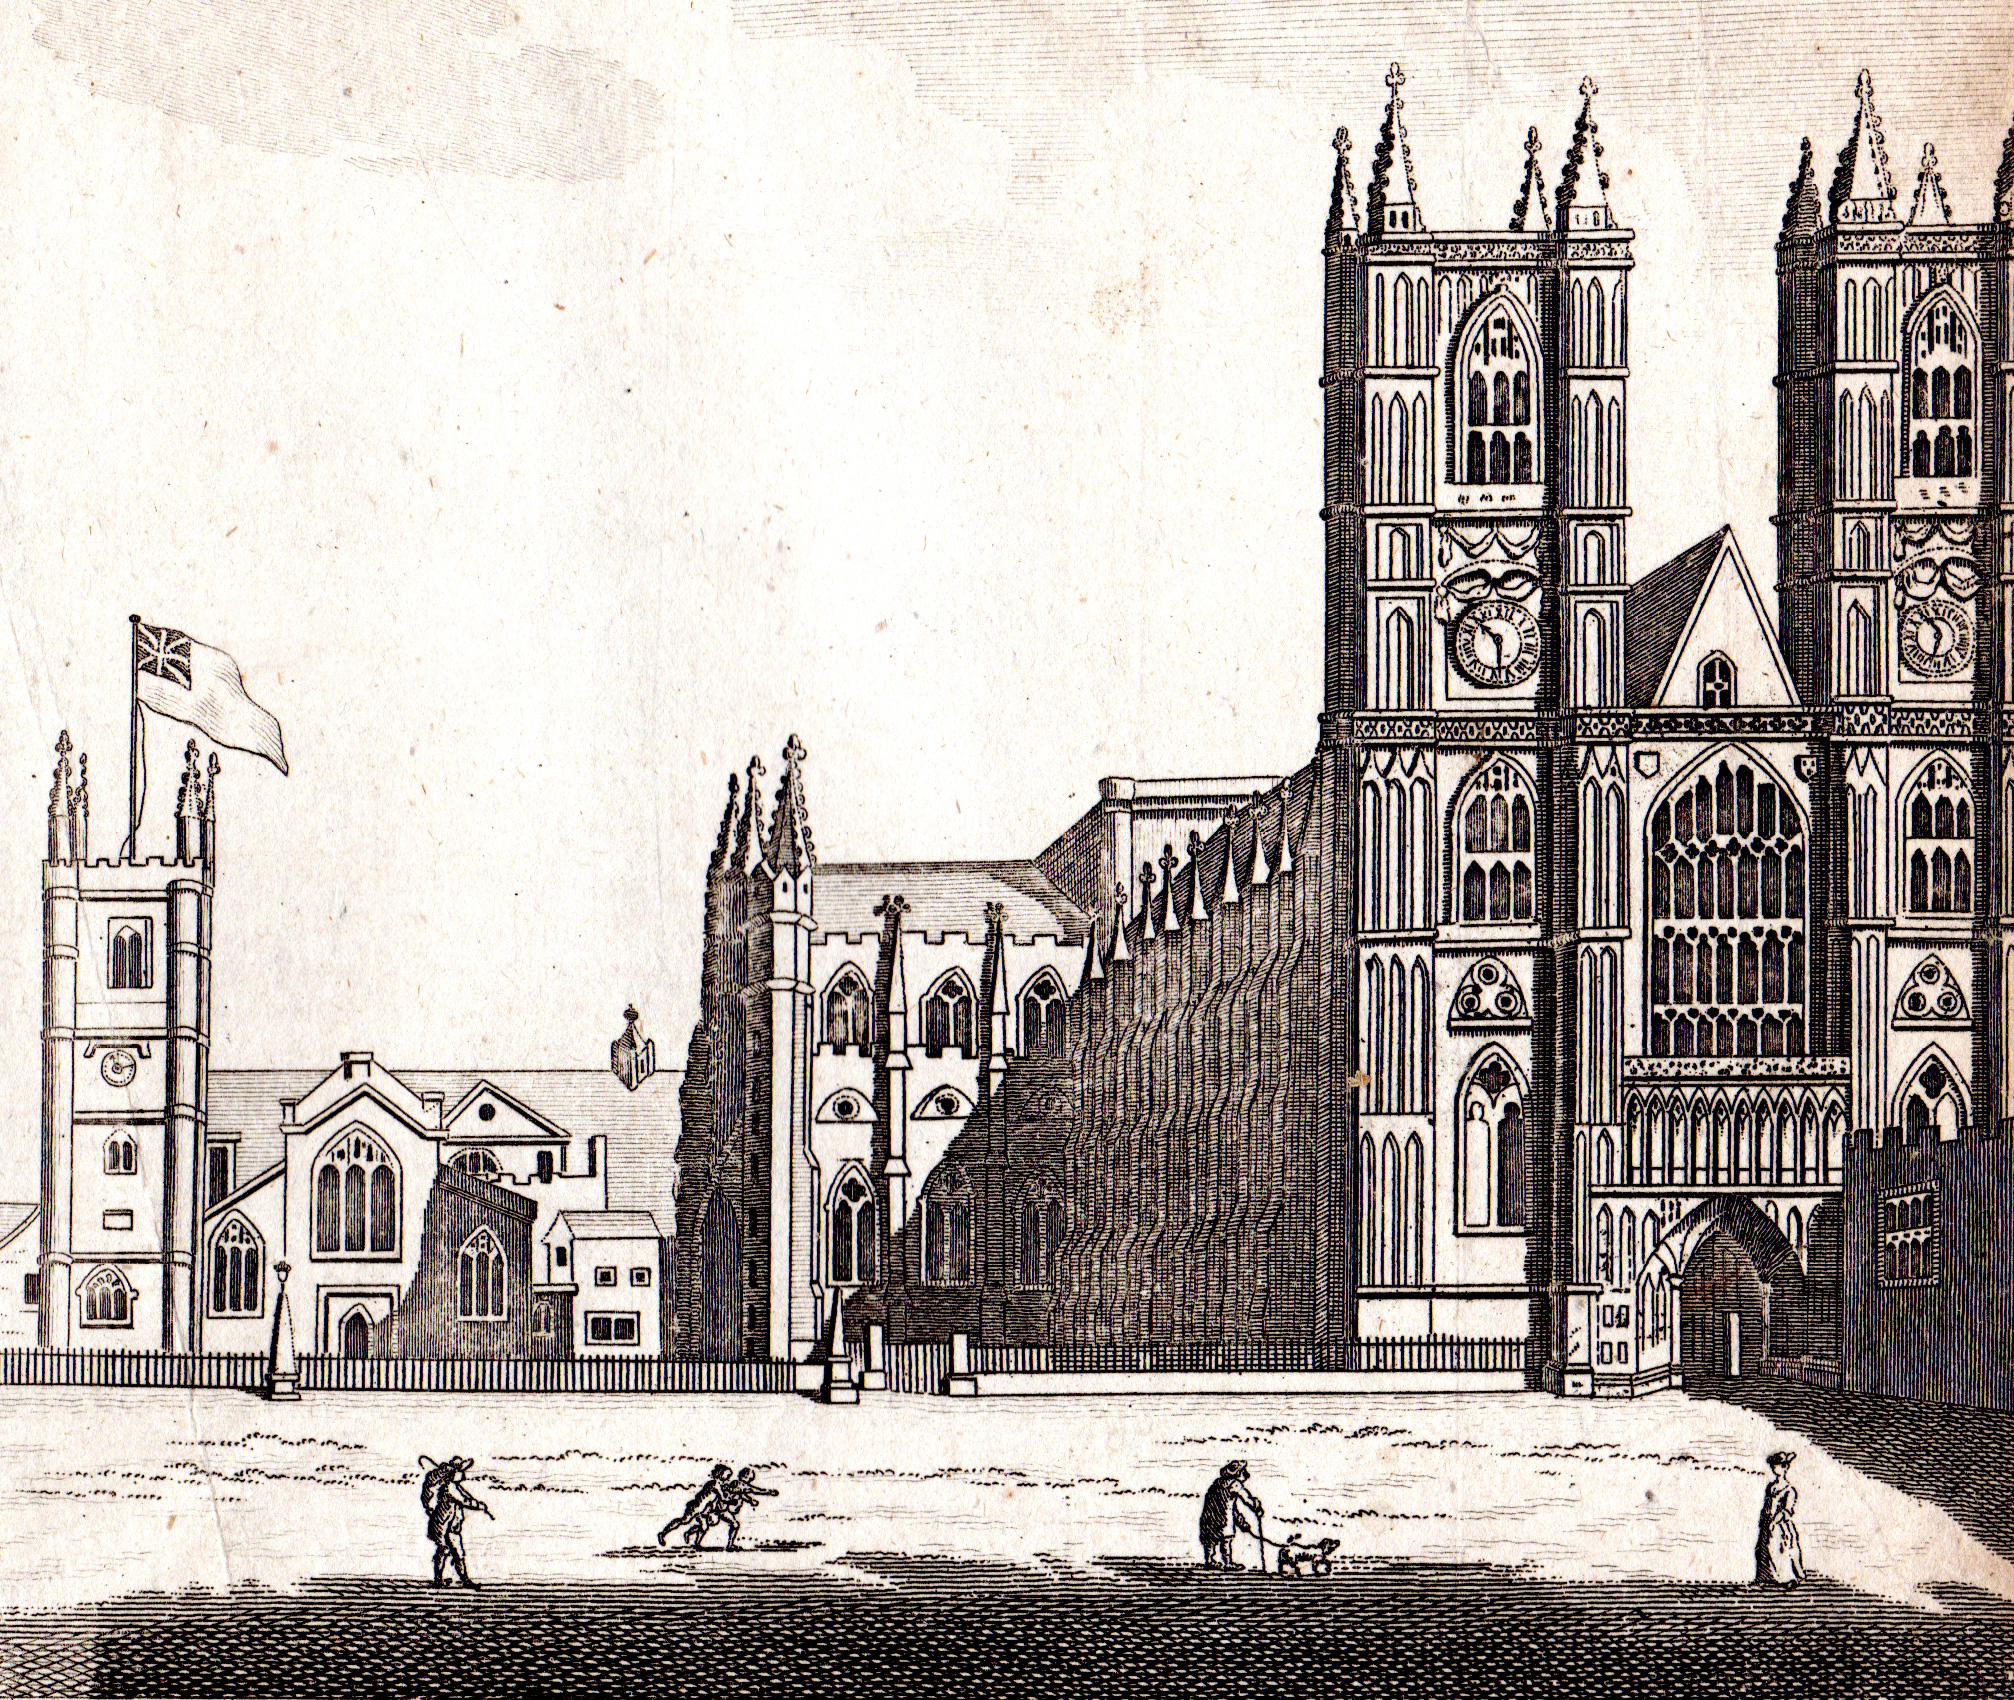 London, England 18th & 19th century prints